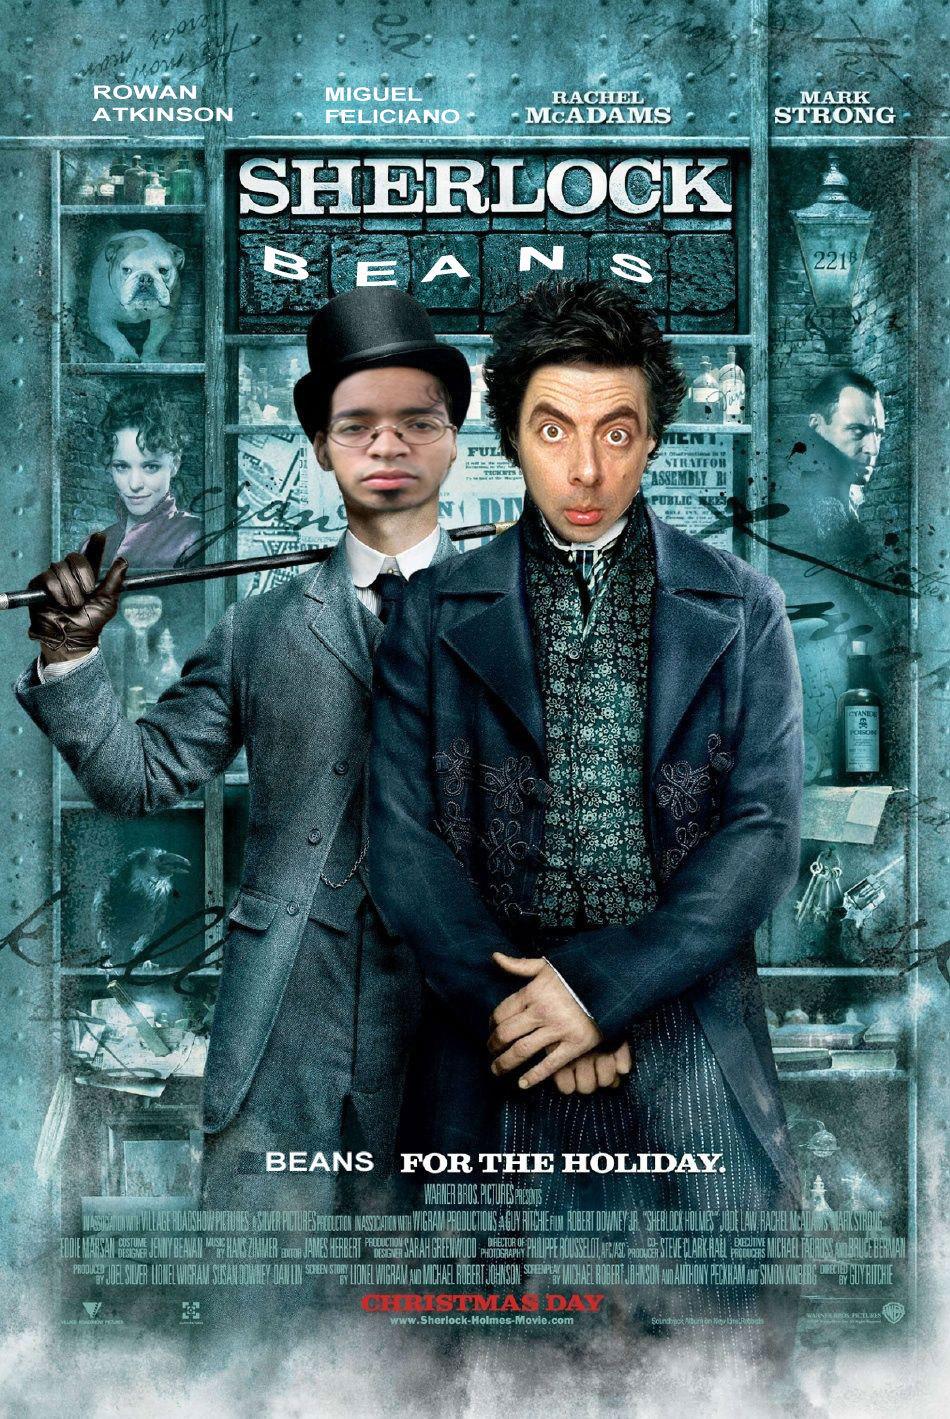 Sherlock Bean